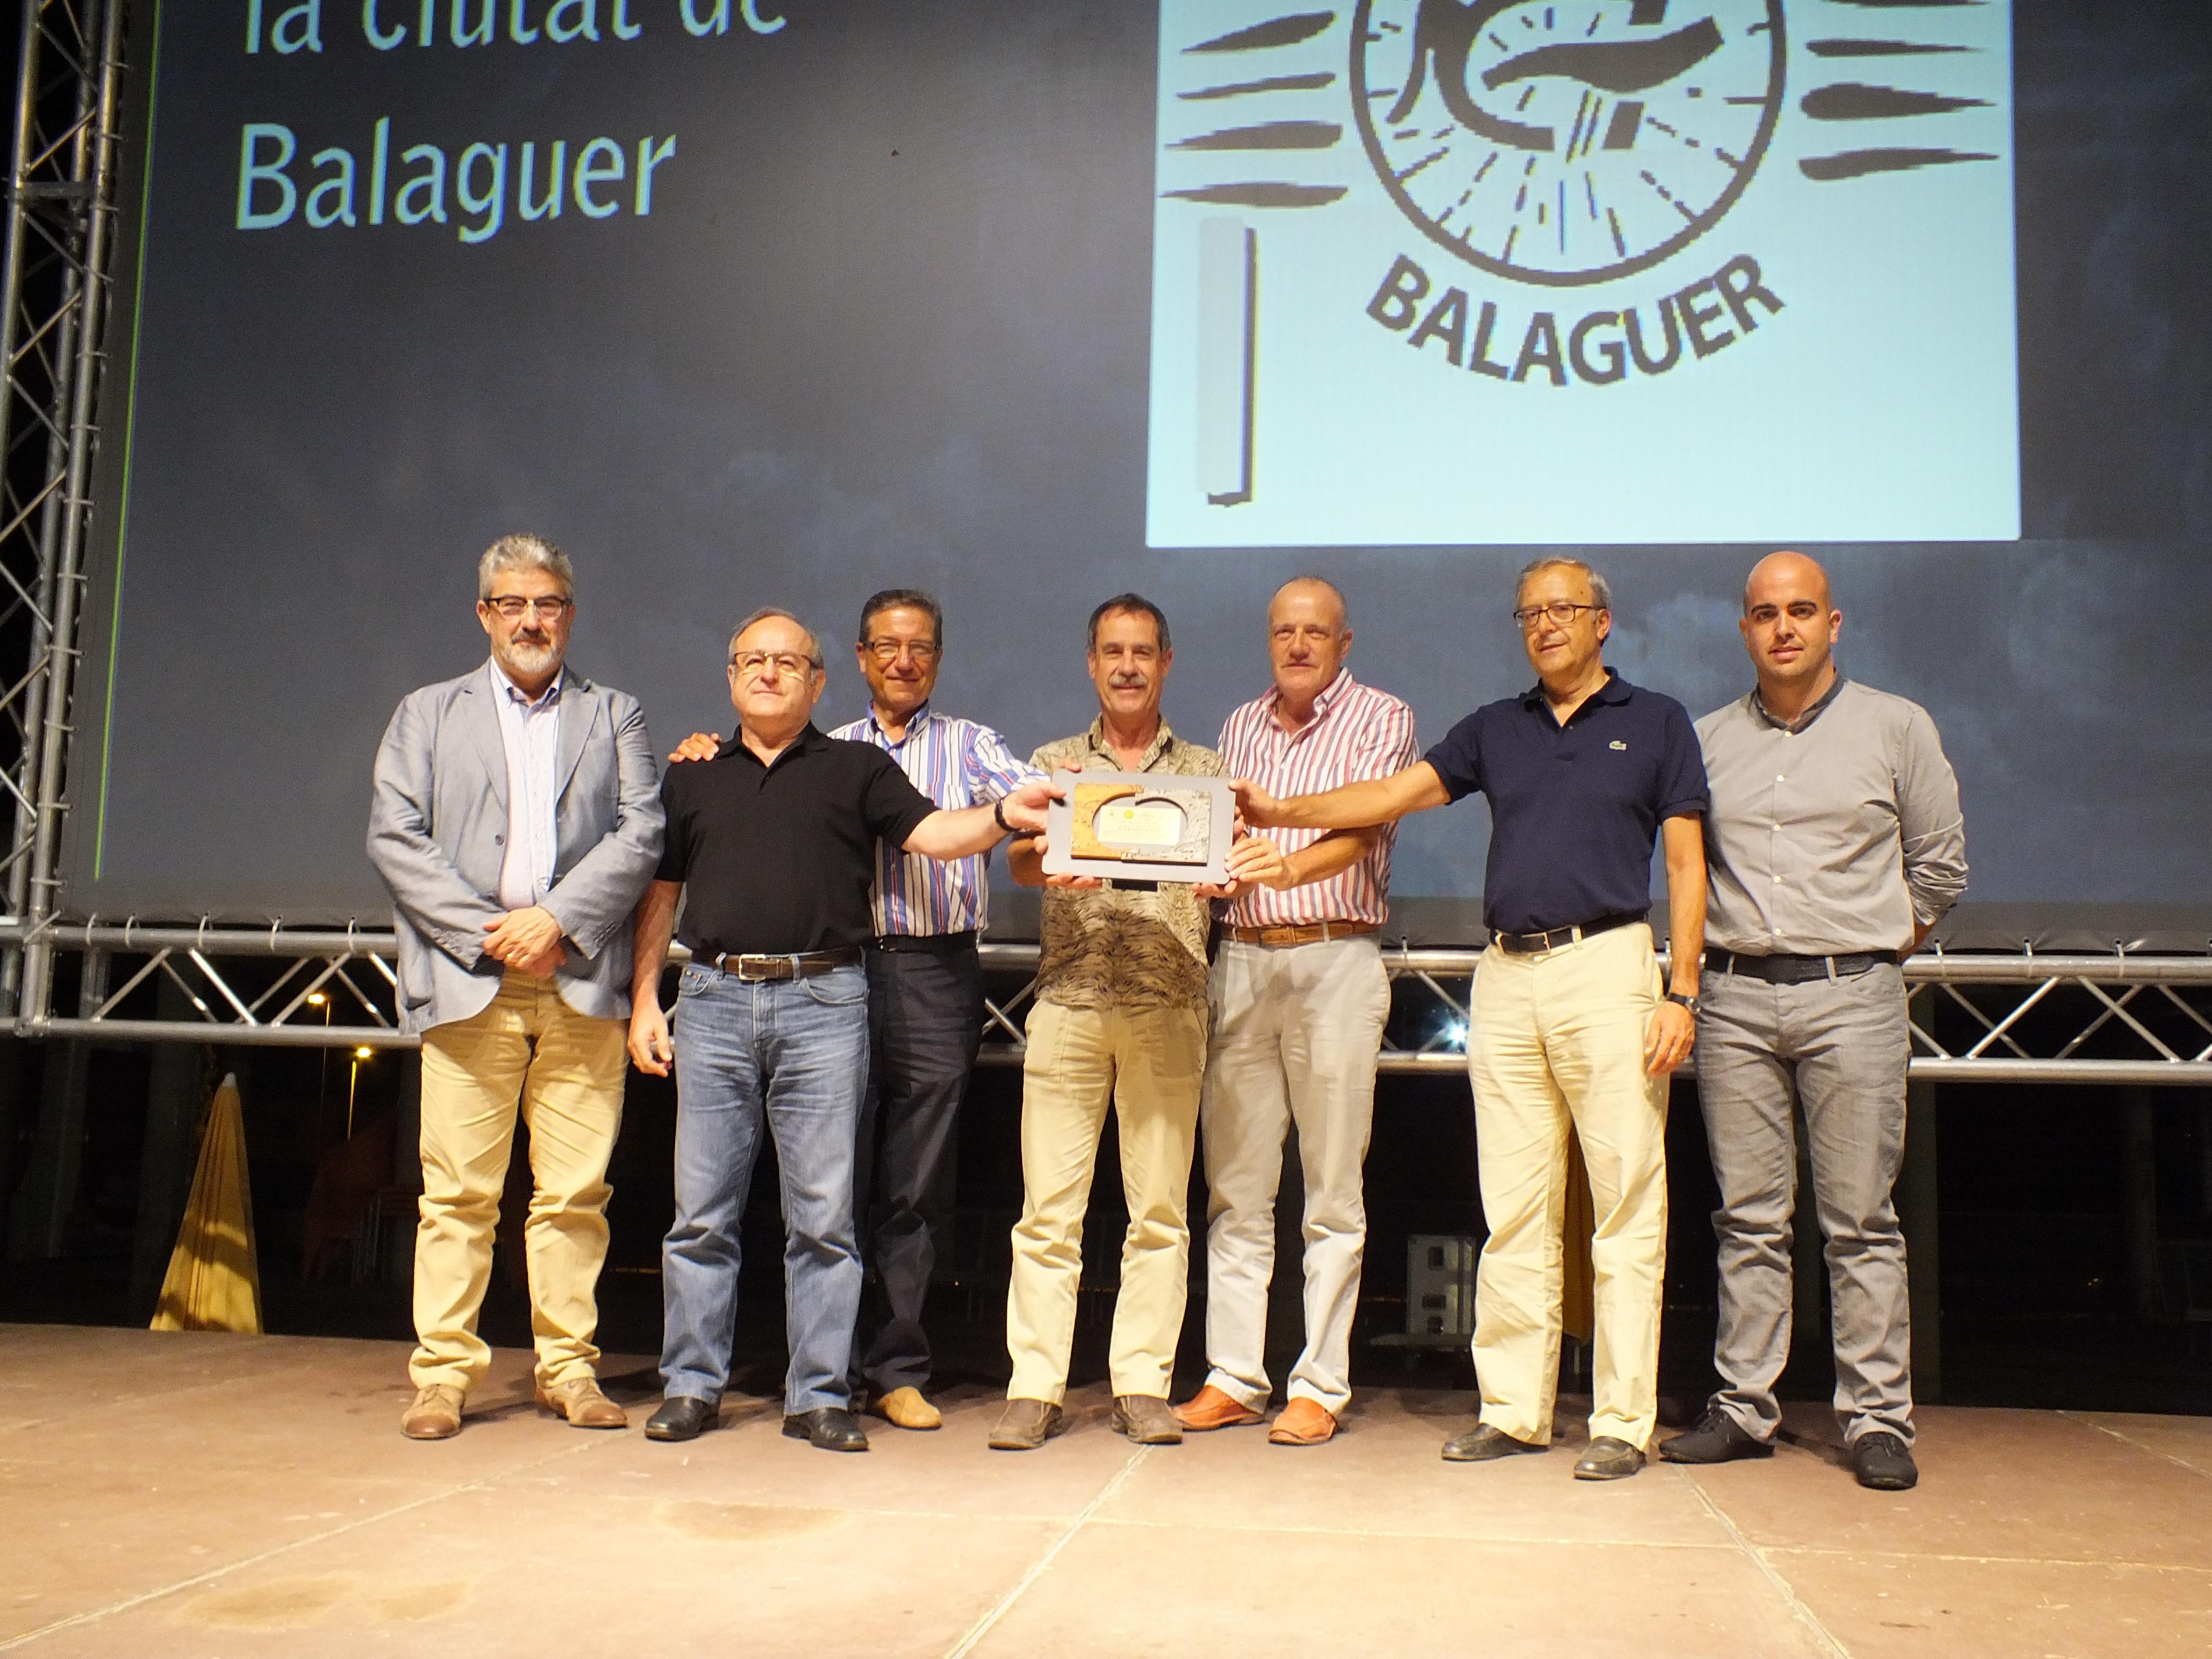 El Cc Balaguer Premiado En La Noche Del Deporte De Balaguer  # Mobles Roure Balaguer